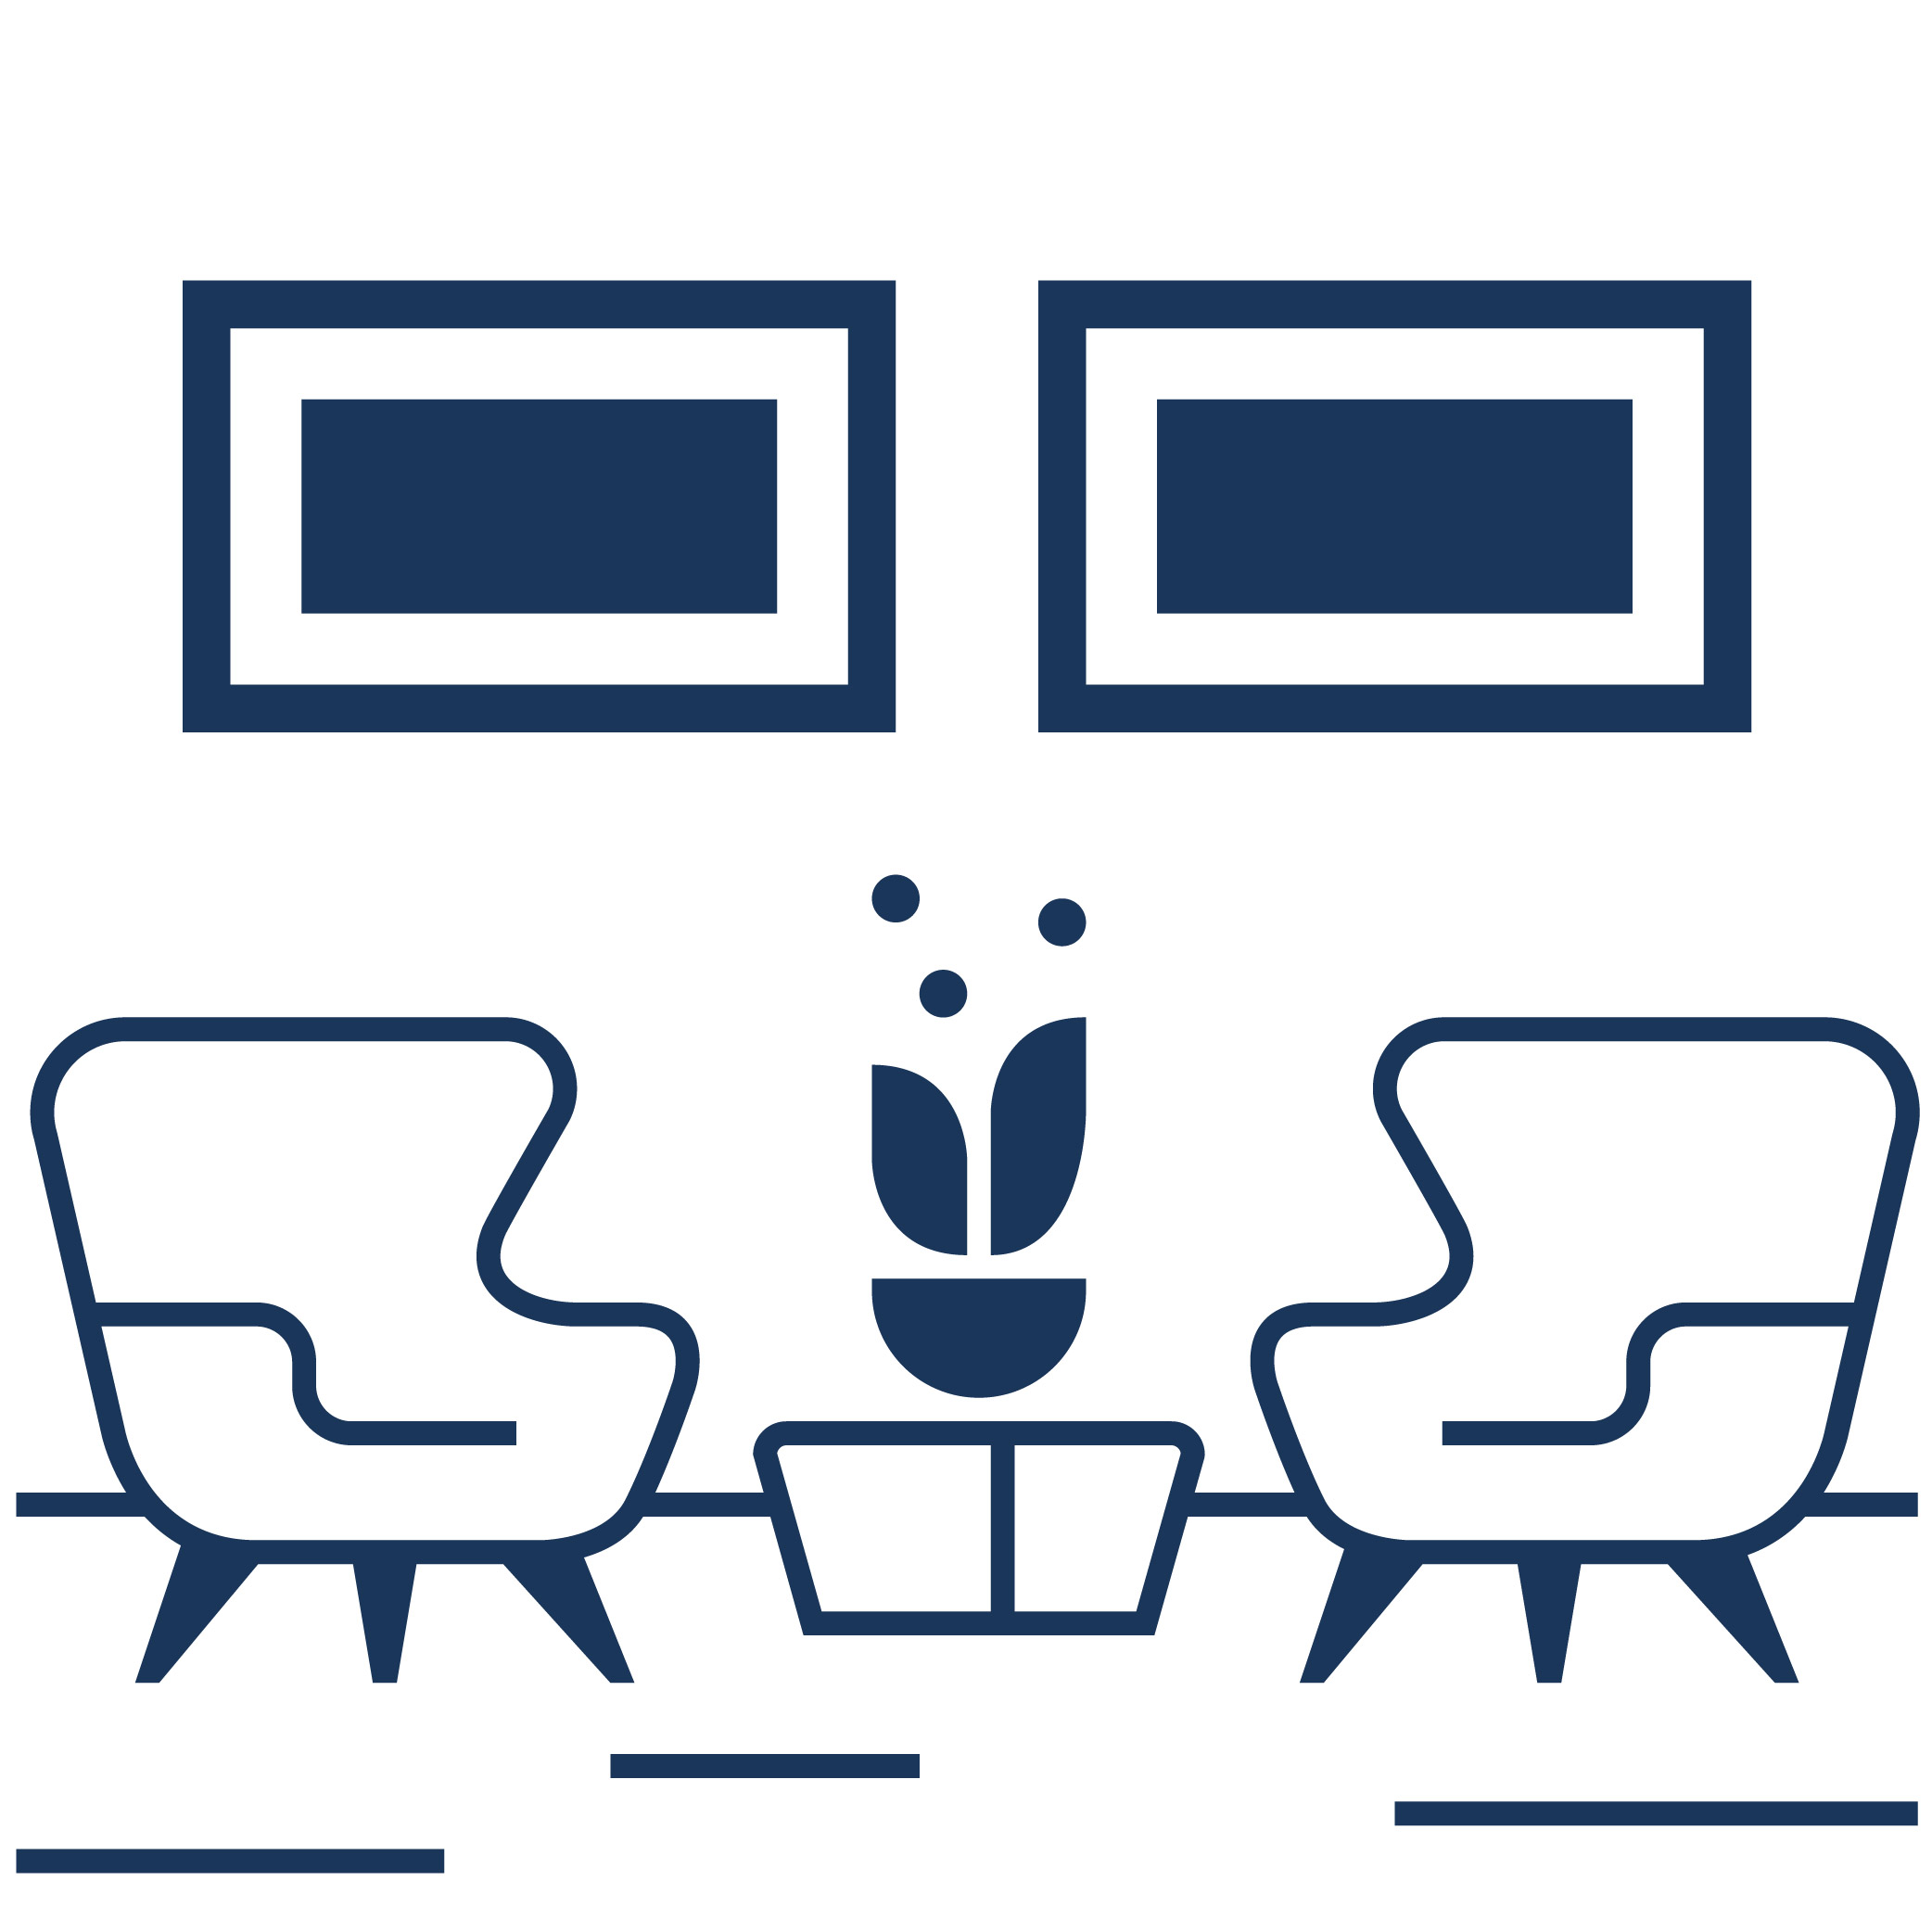 Gelpi Design Icons set design for Five by Five agency